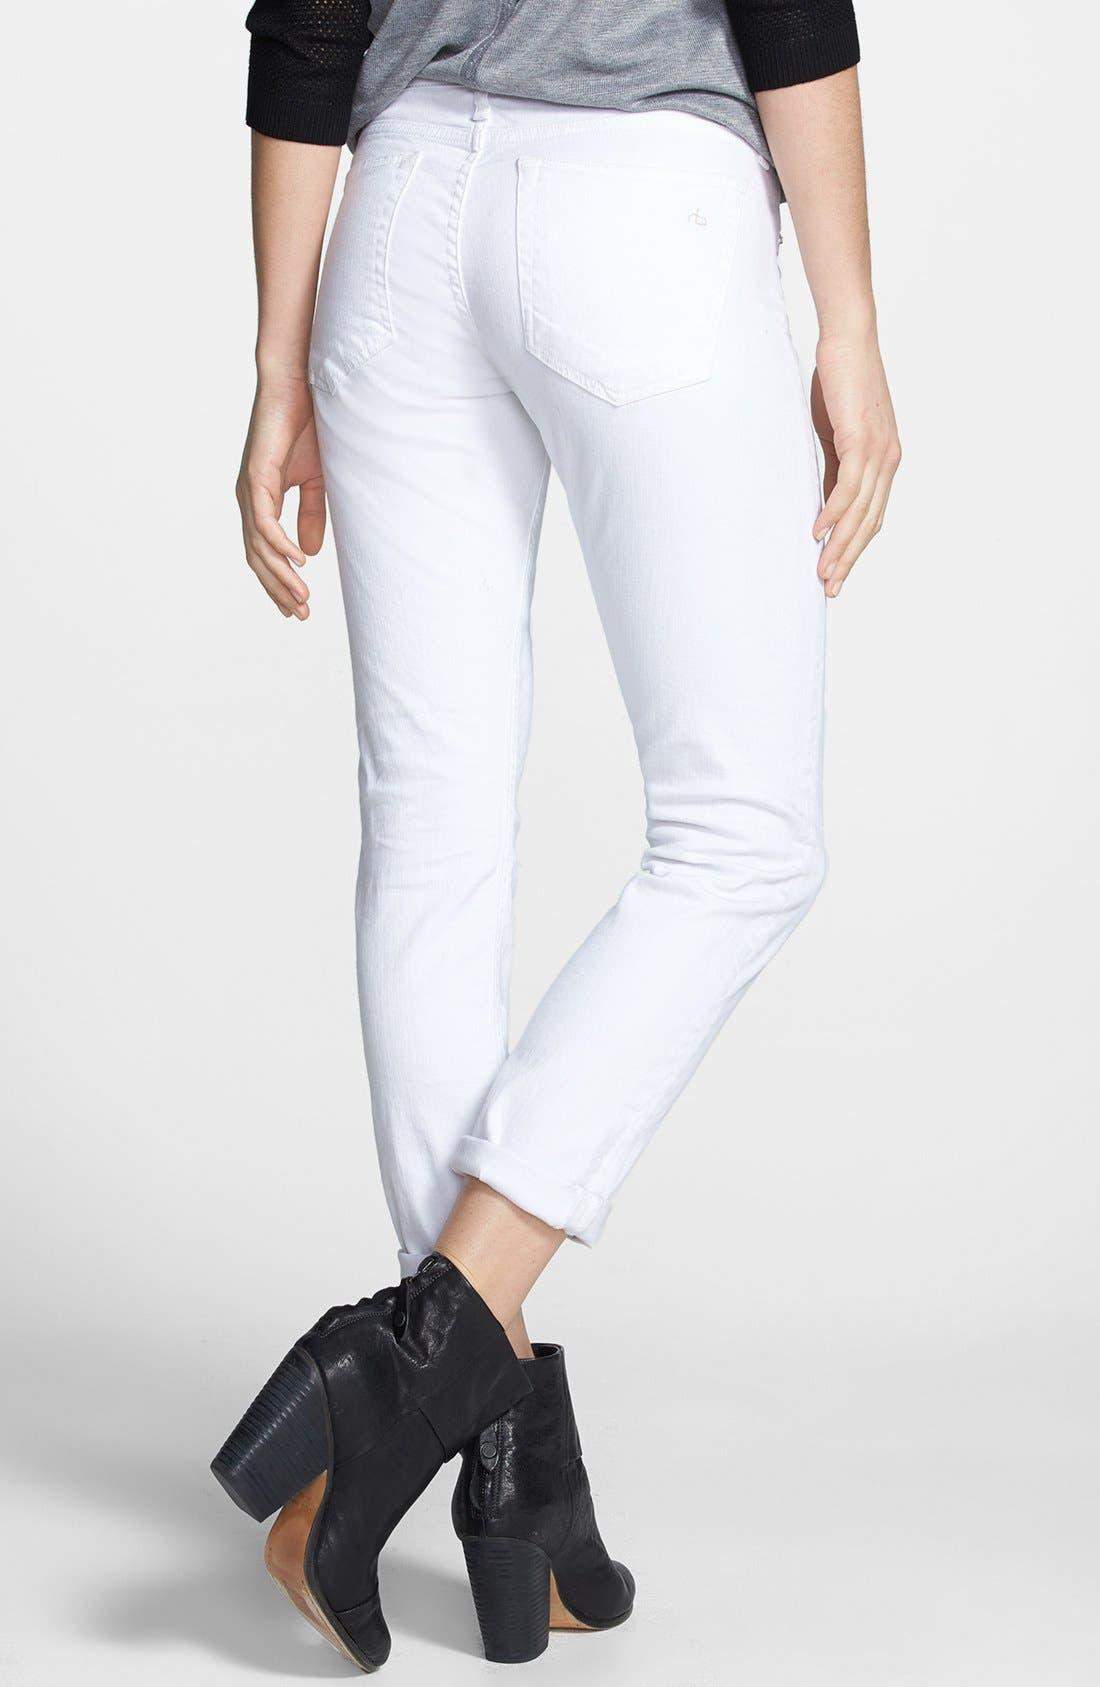 'The Dre' Skinny Jeans,                             Alternate thumbnail 9, color,                             BRIGHT WHITE